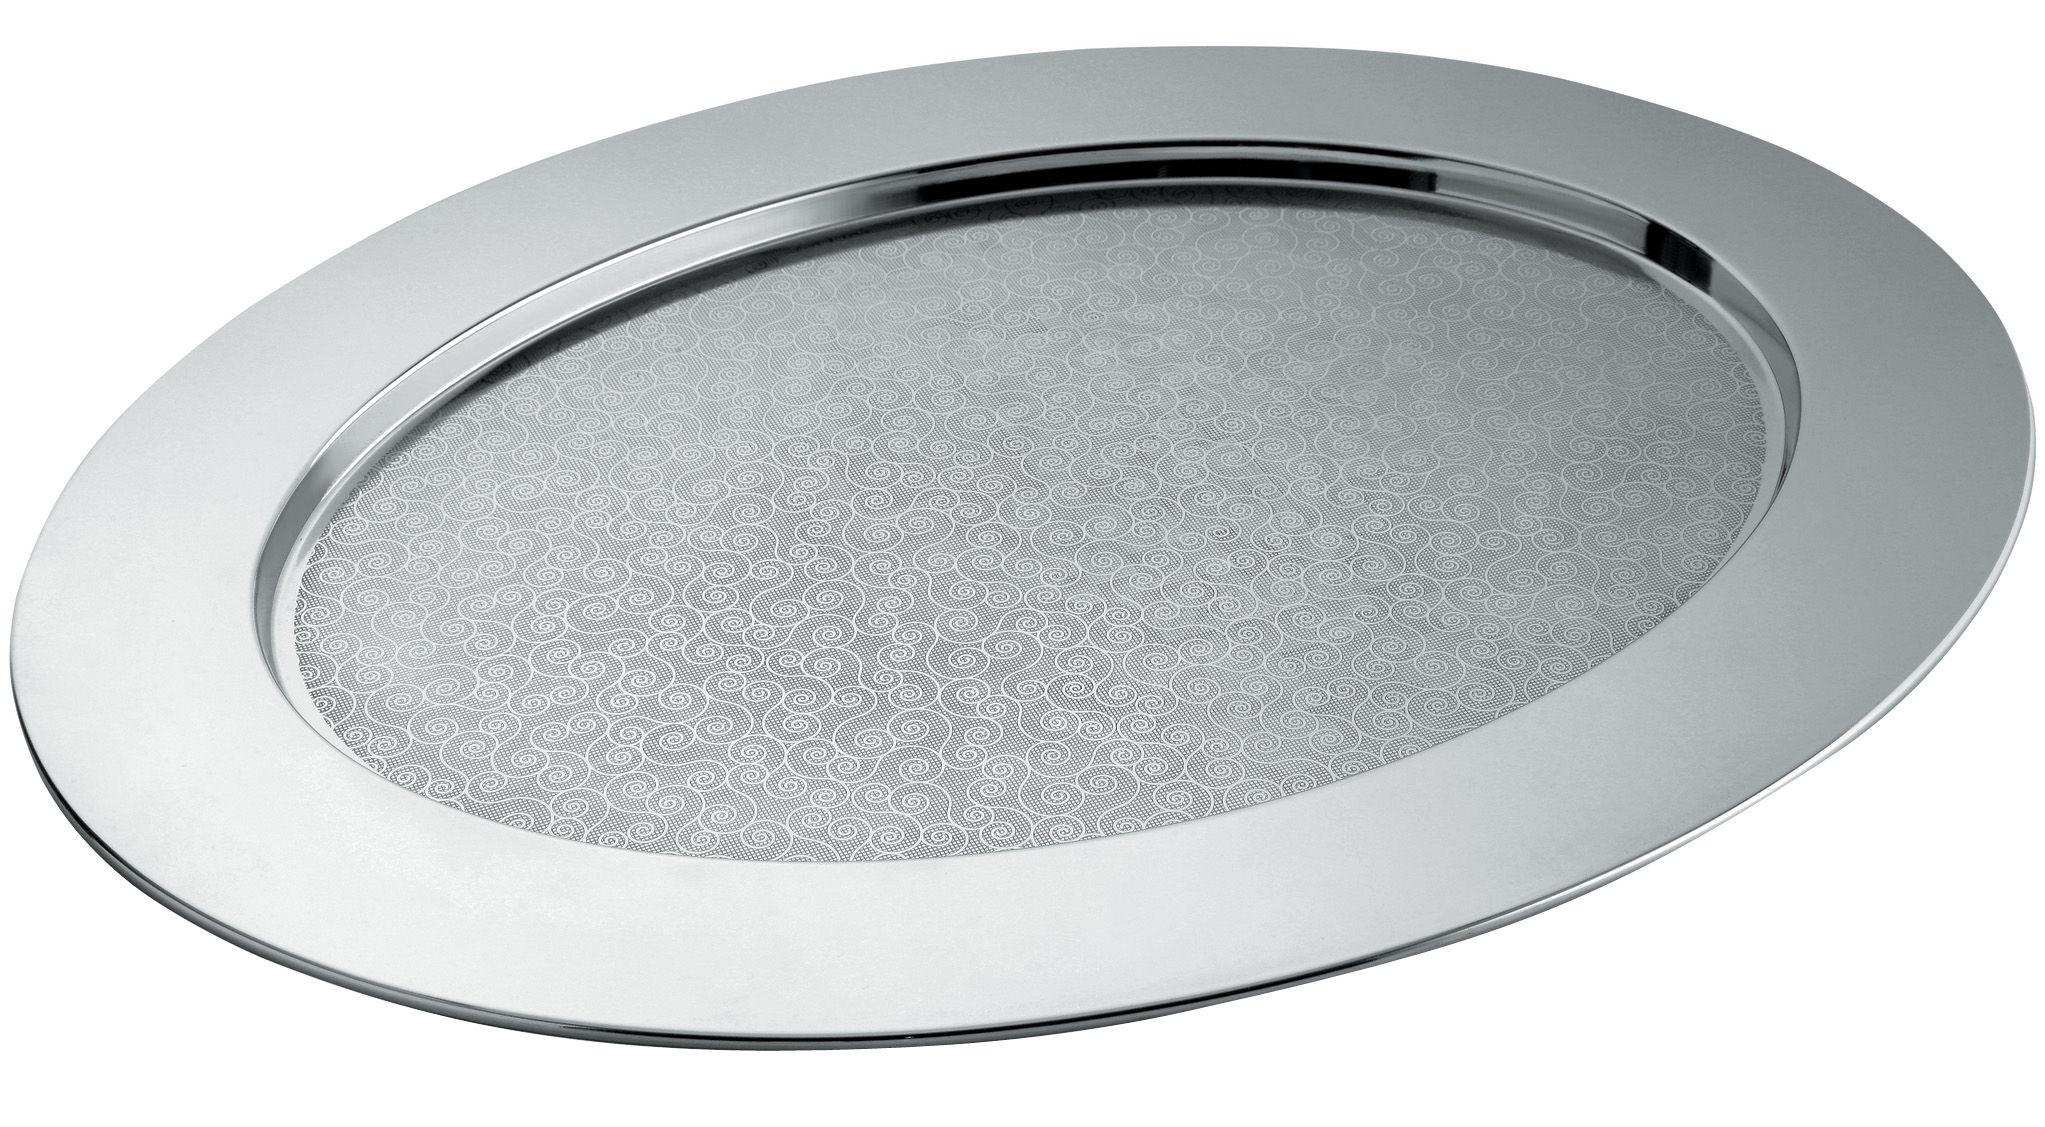 ovale cesellato alessi tablett. Black Bedroom Furniture Sets. Home Design Ideas